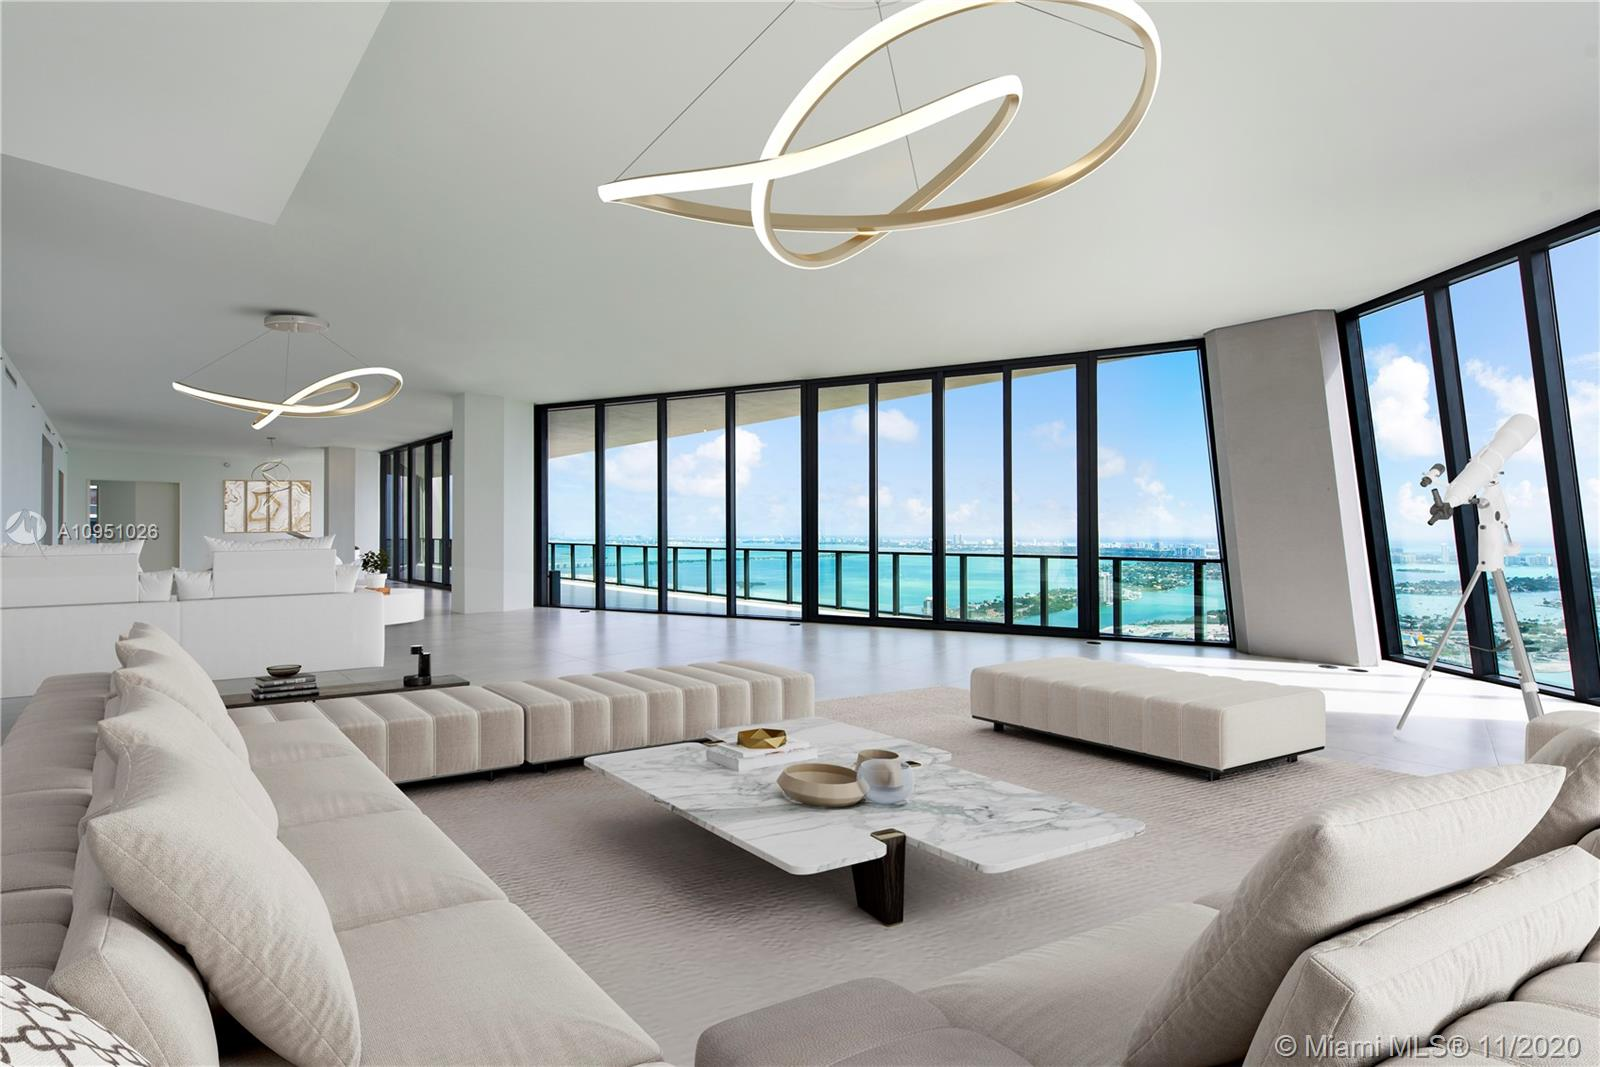 1000 Biscayne Blvd, Unit #5401 Luxury Real Estate